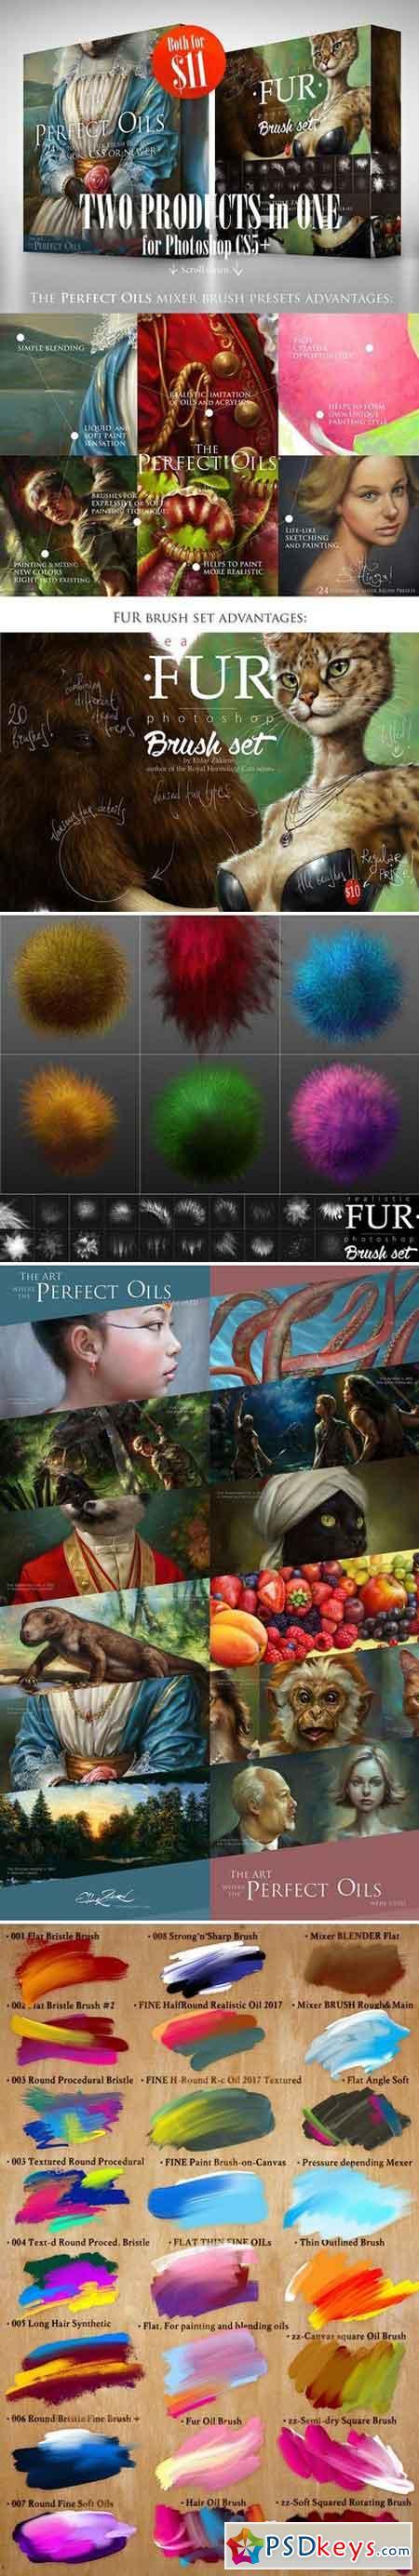 2 in 1 Prefect Oils & FUR Brushsets 2227611